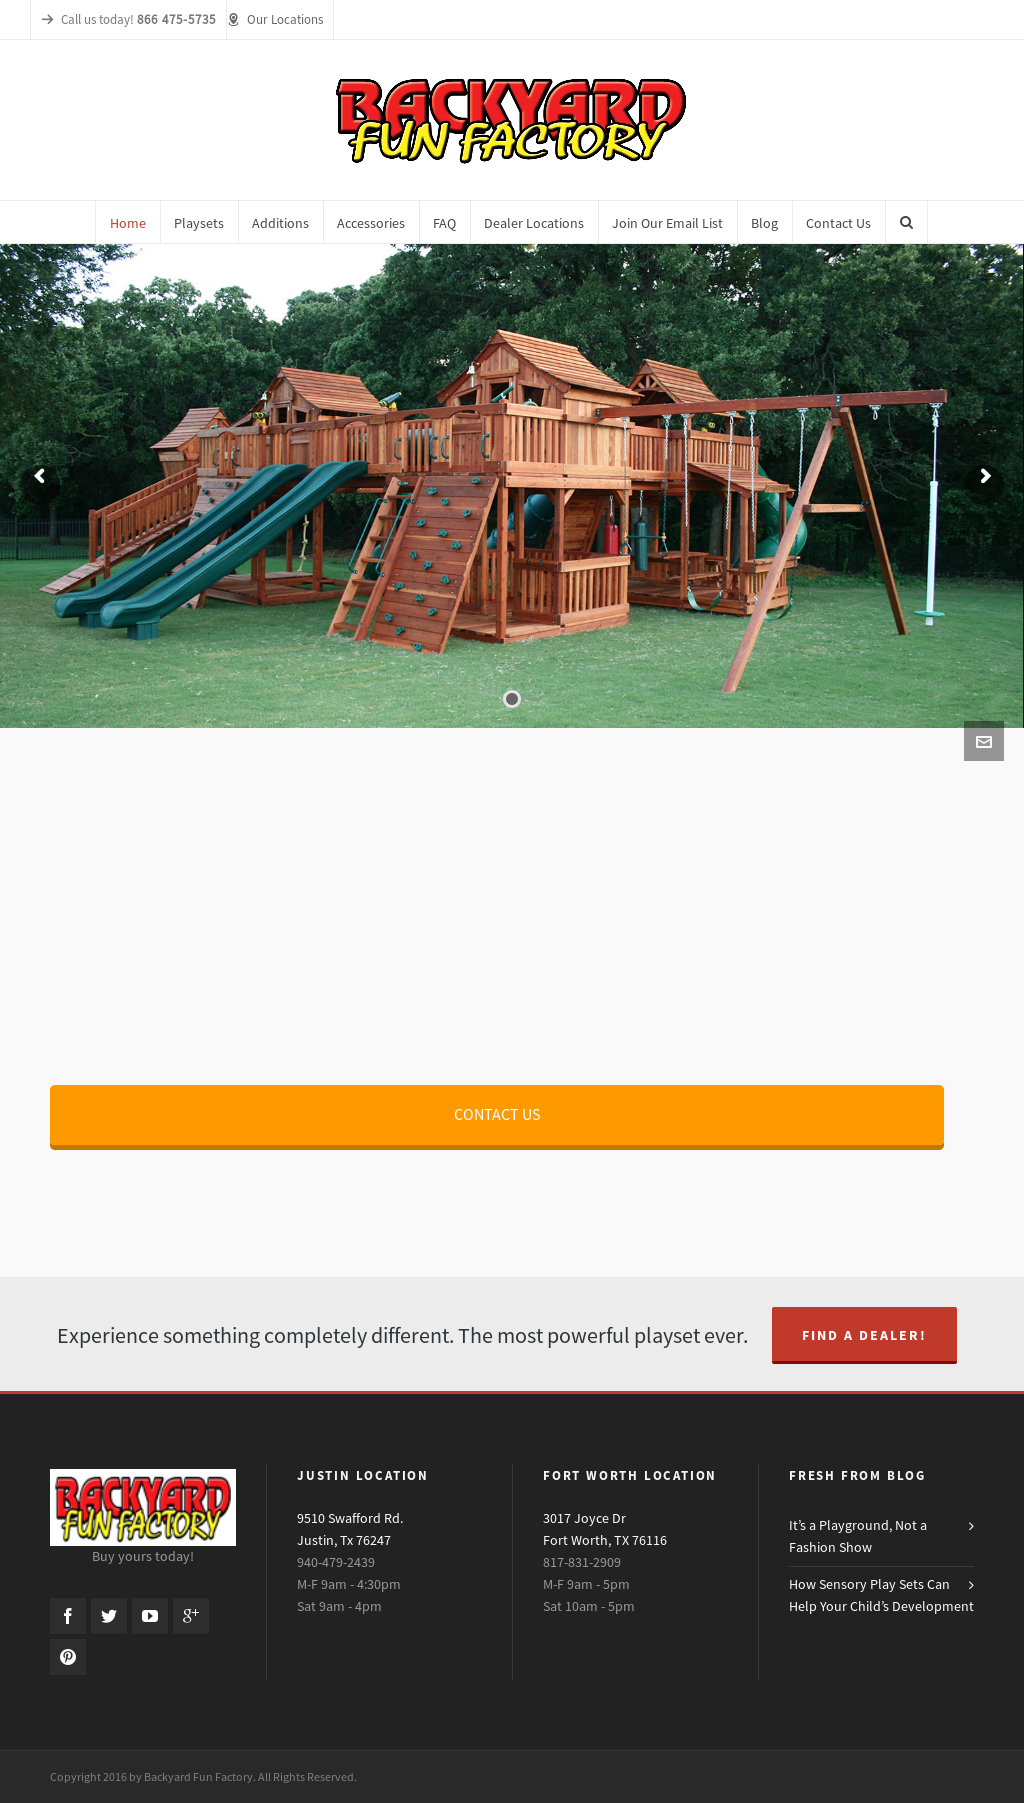 Backyard Fun Factory Website History